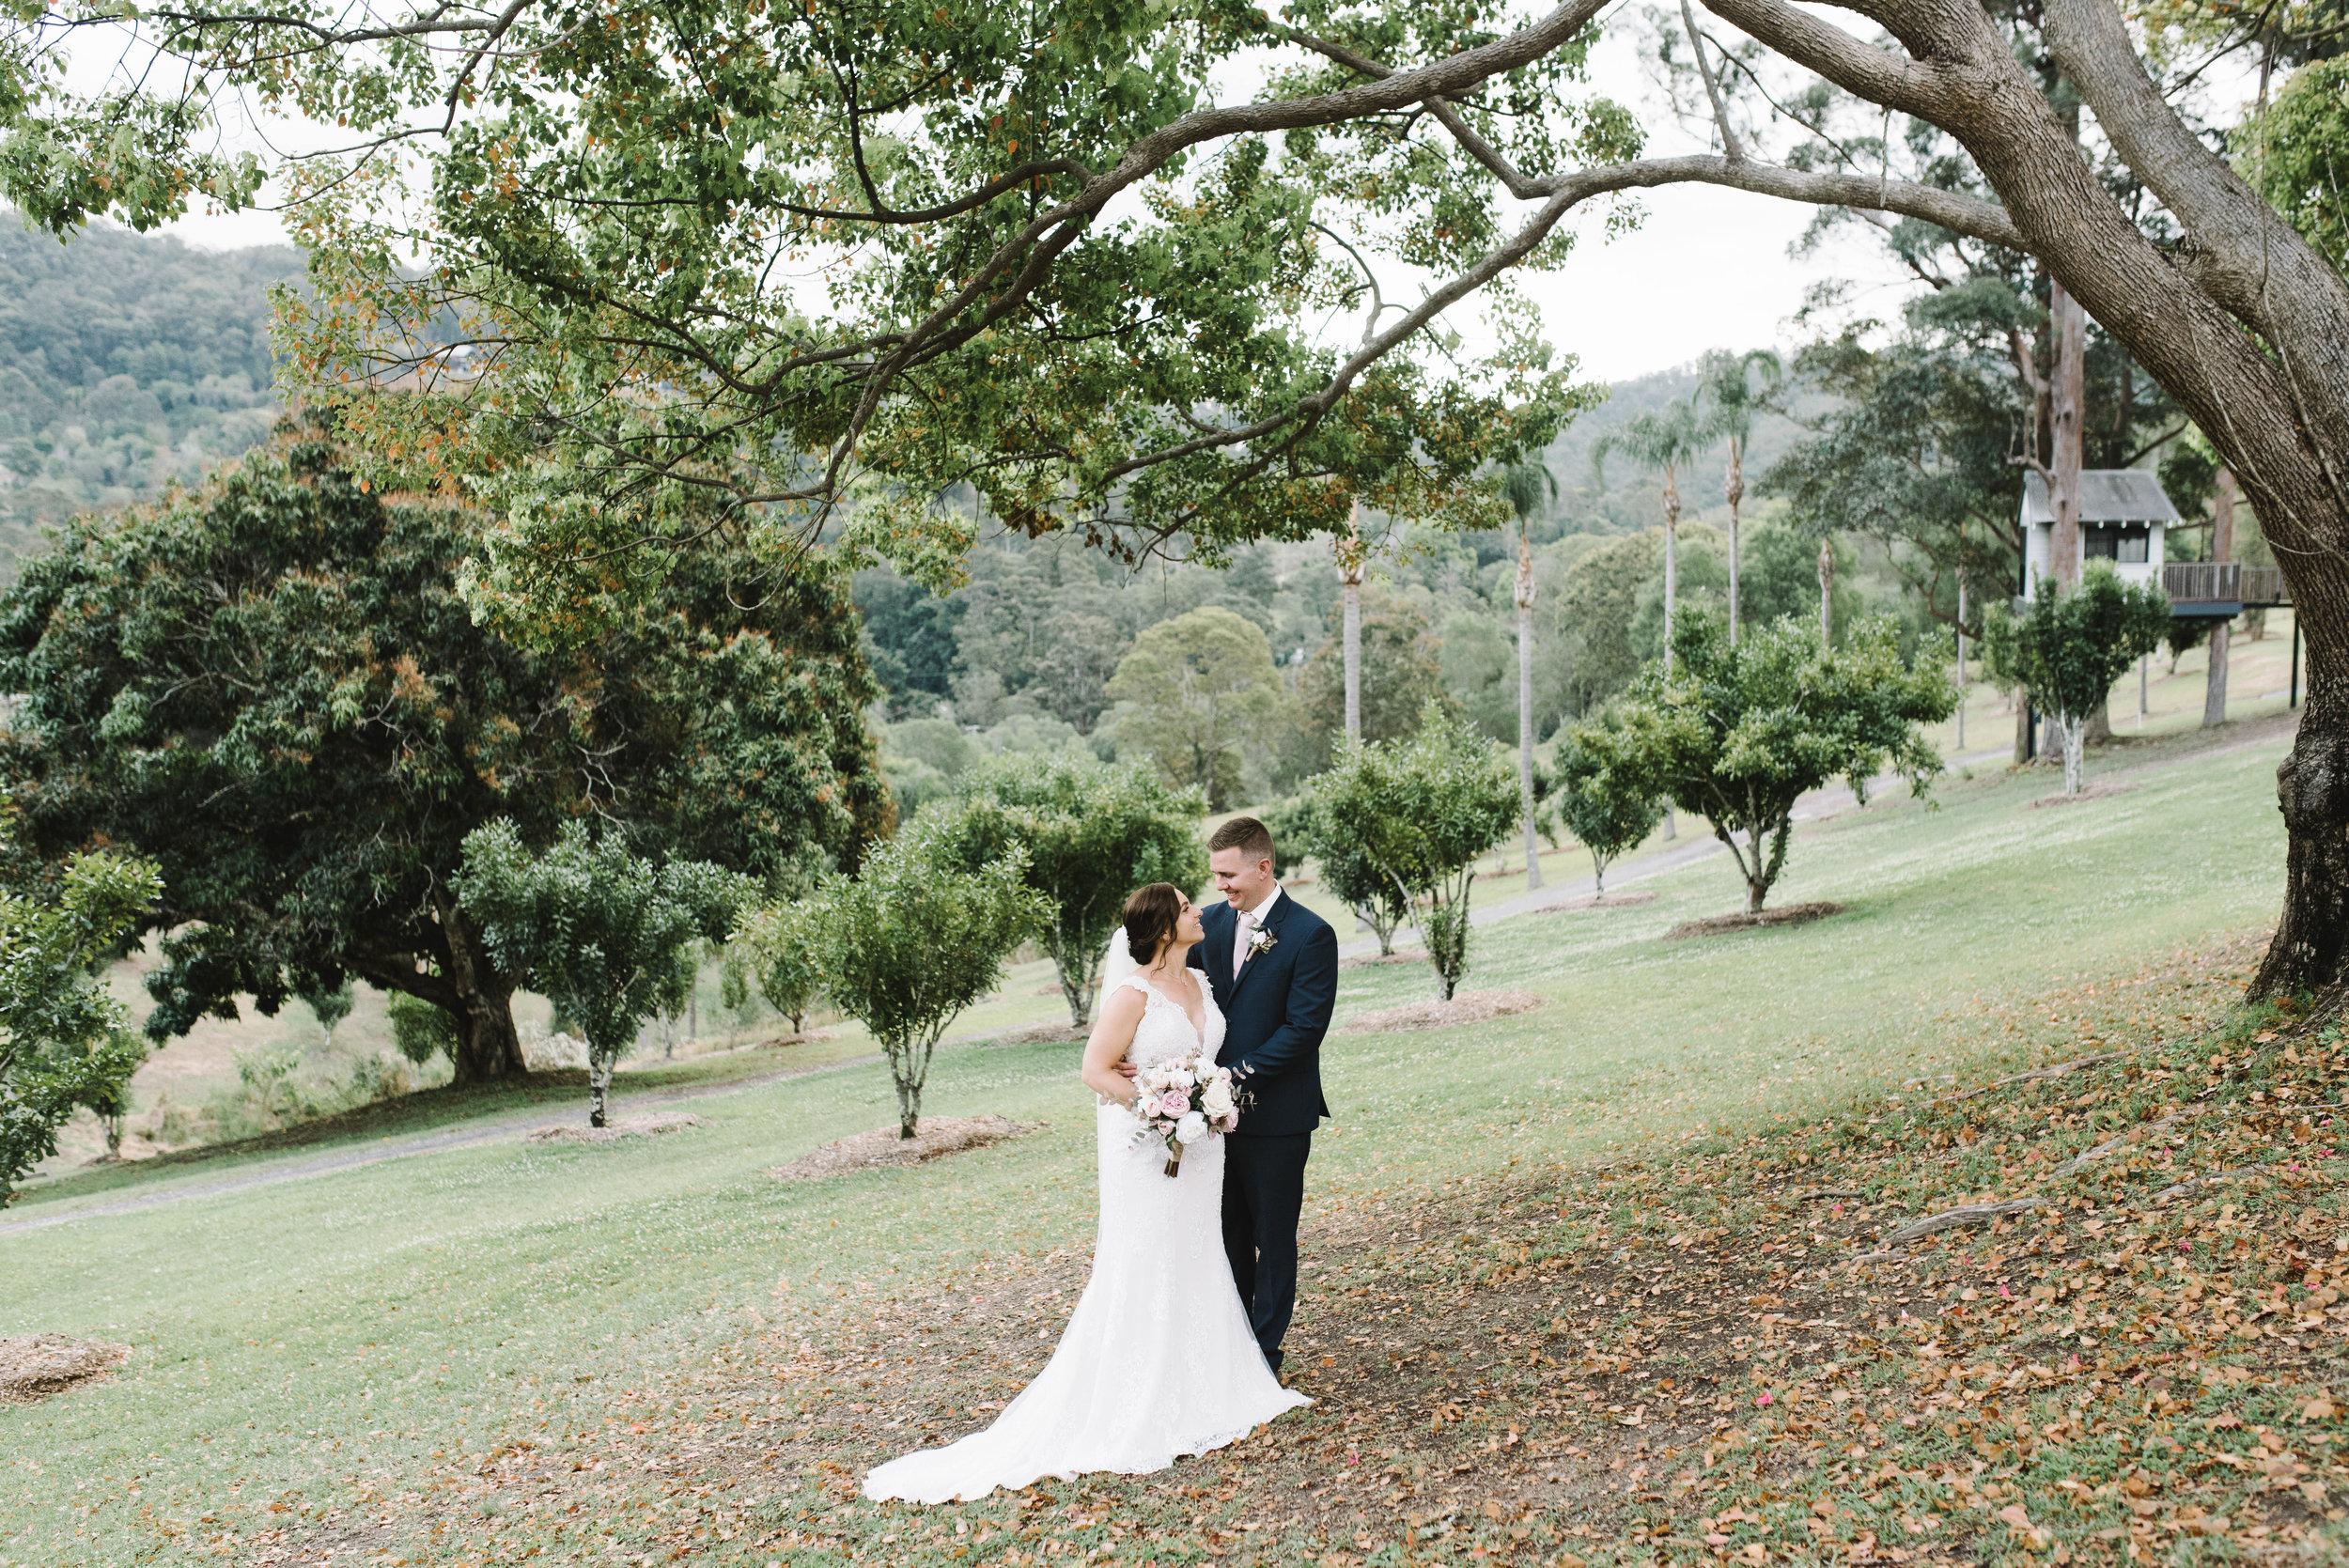 LAURENOLIVIA-austinvilla-estate-wedding-60.jpg